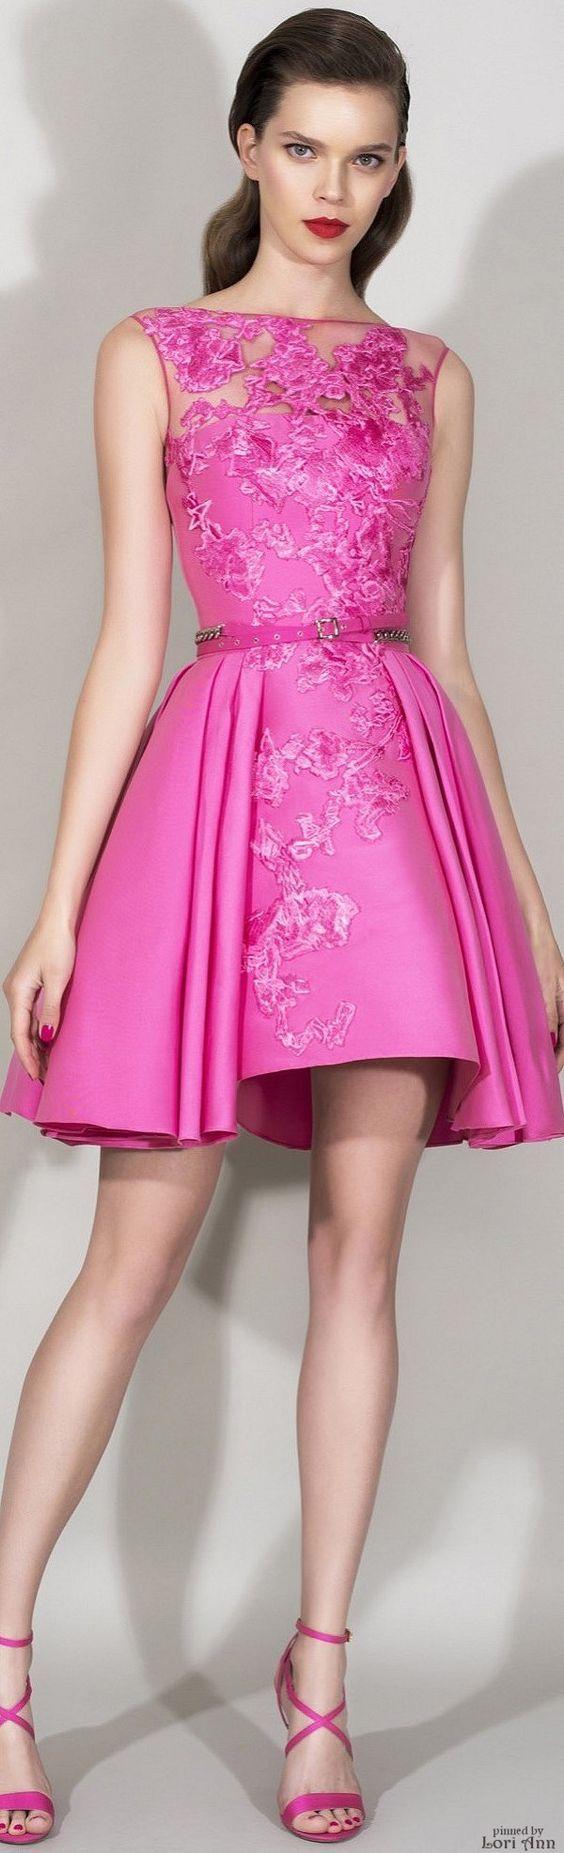 814 mejores imágenes de robes magnifiques en Pinterest   Vestidos de ...